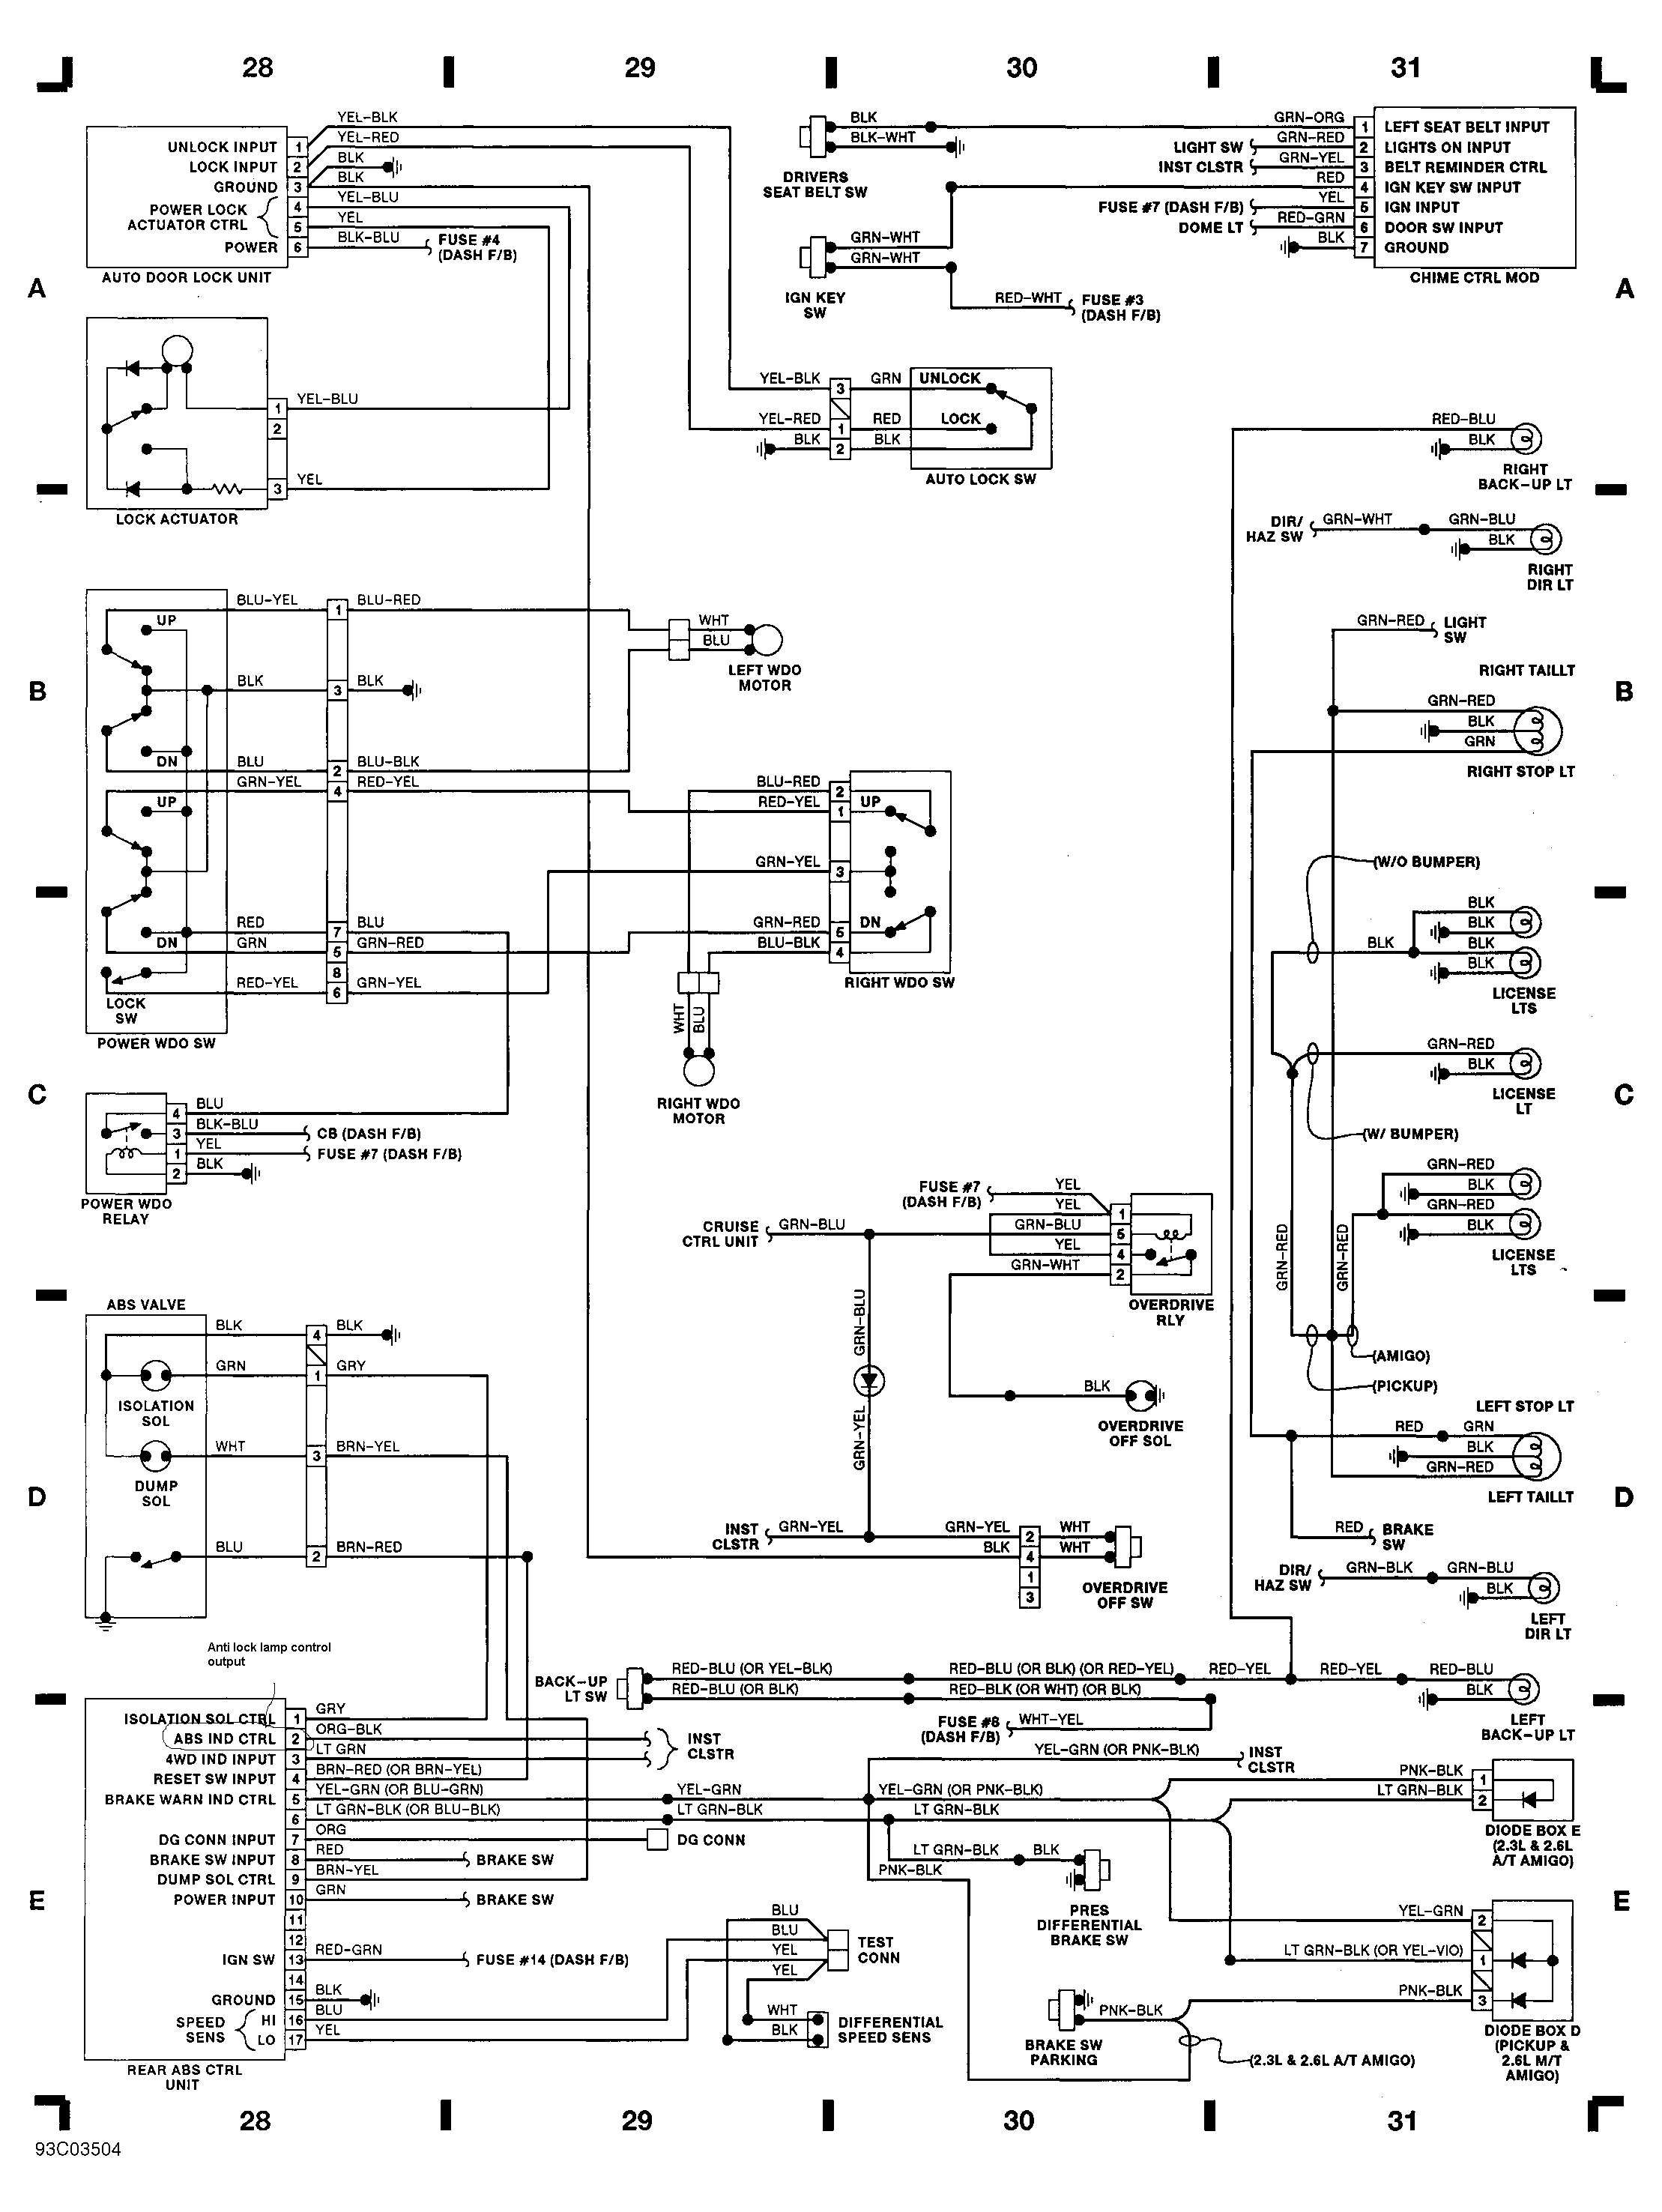 Wiring Diagram Cars Trucks Trailer wiring diagram